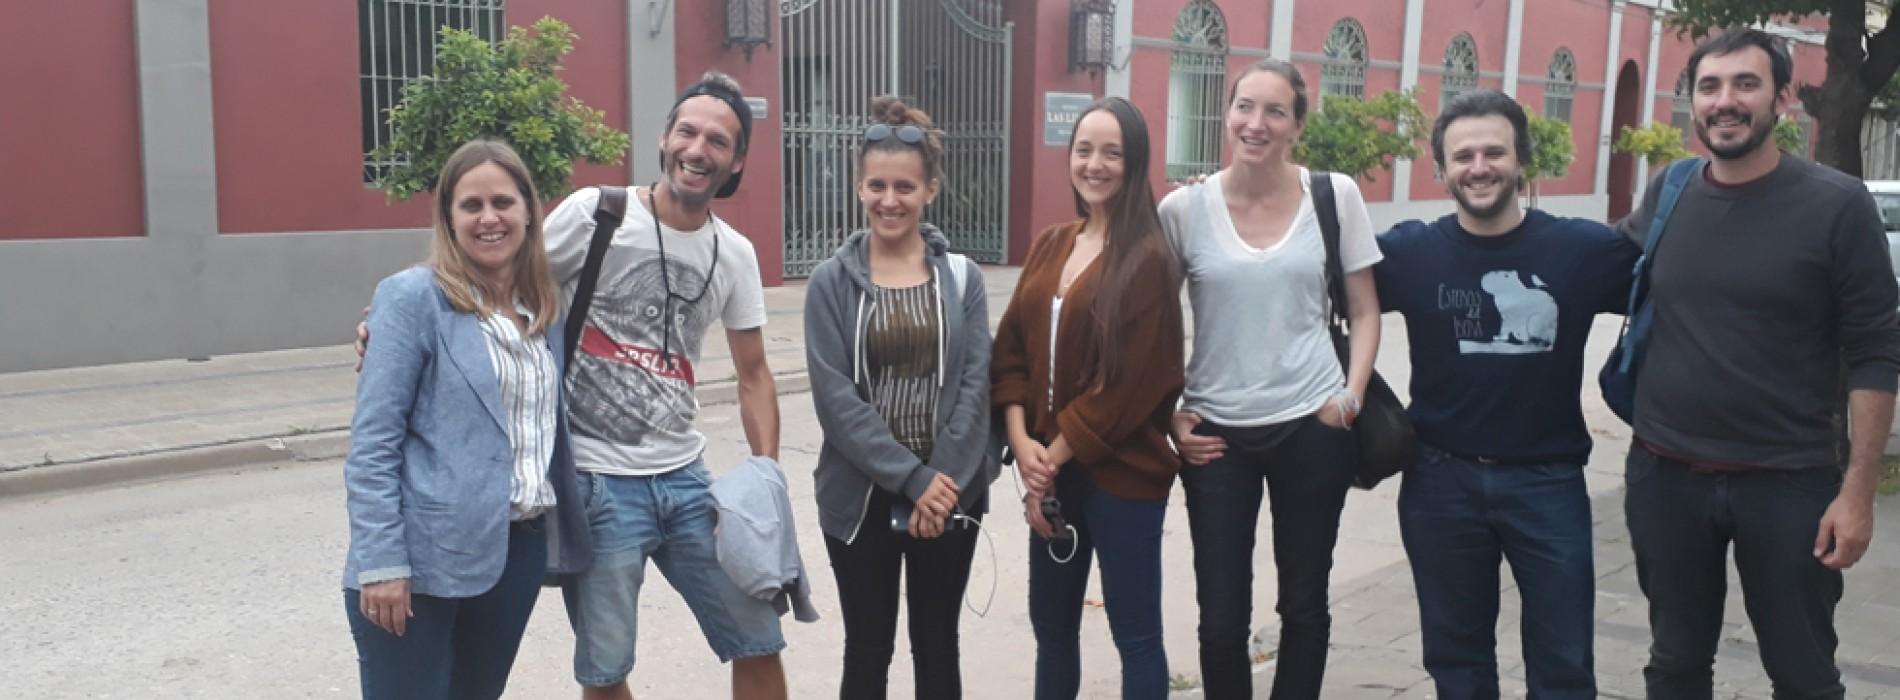 UK influencers in Argentina